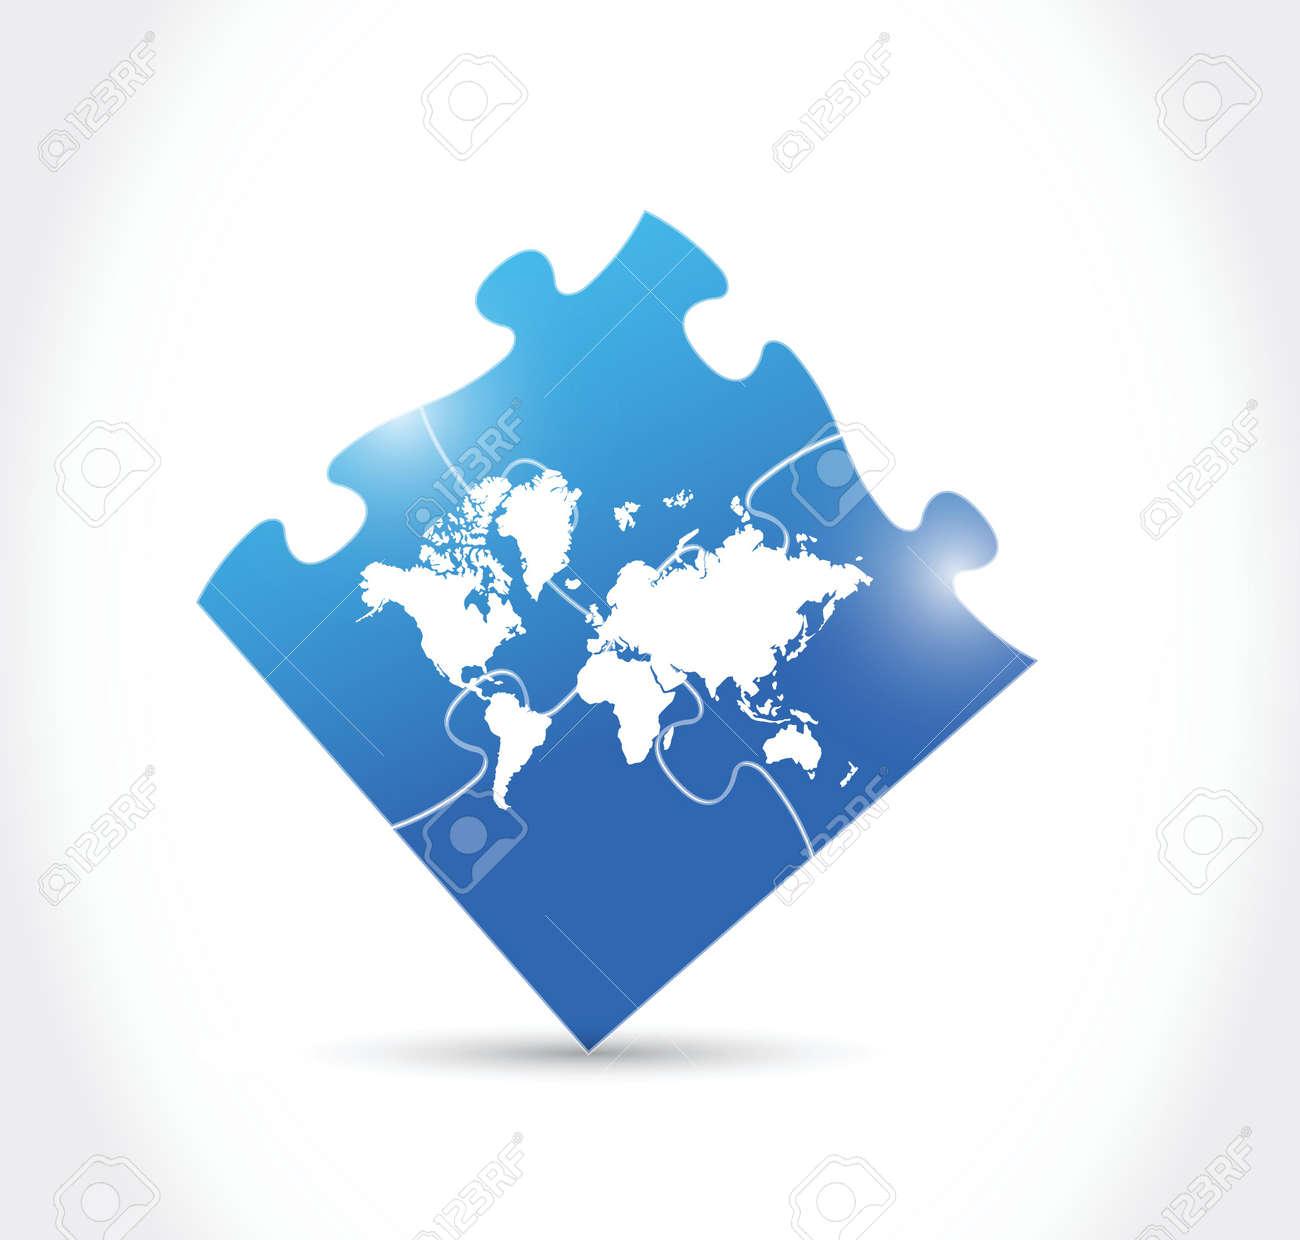 World map blue puzzle illustration design over a white background vector world map blue puzzle illustration design over a white background gumiabroncs Images